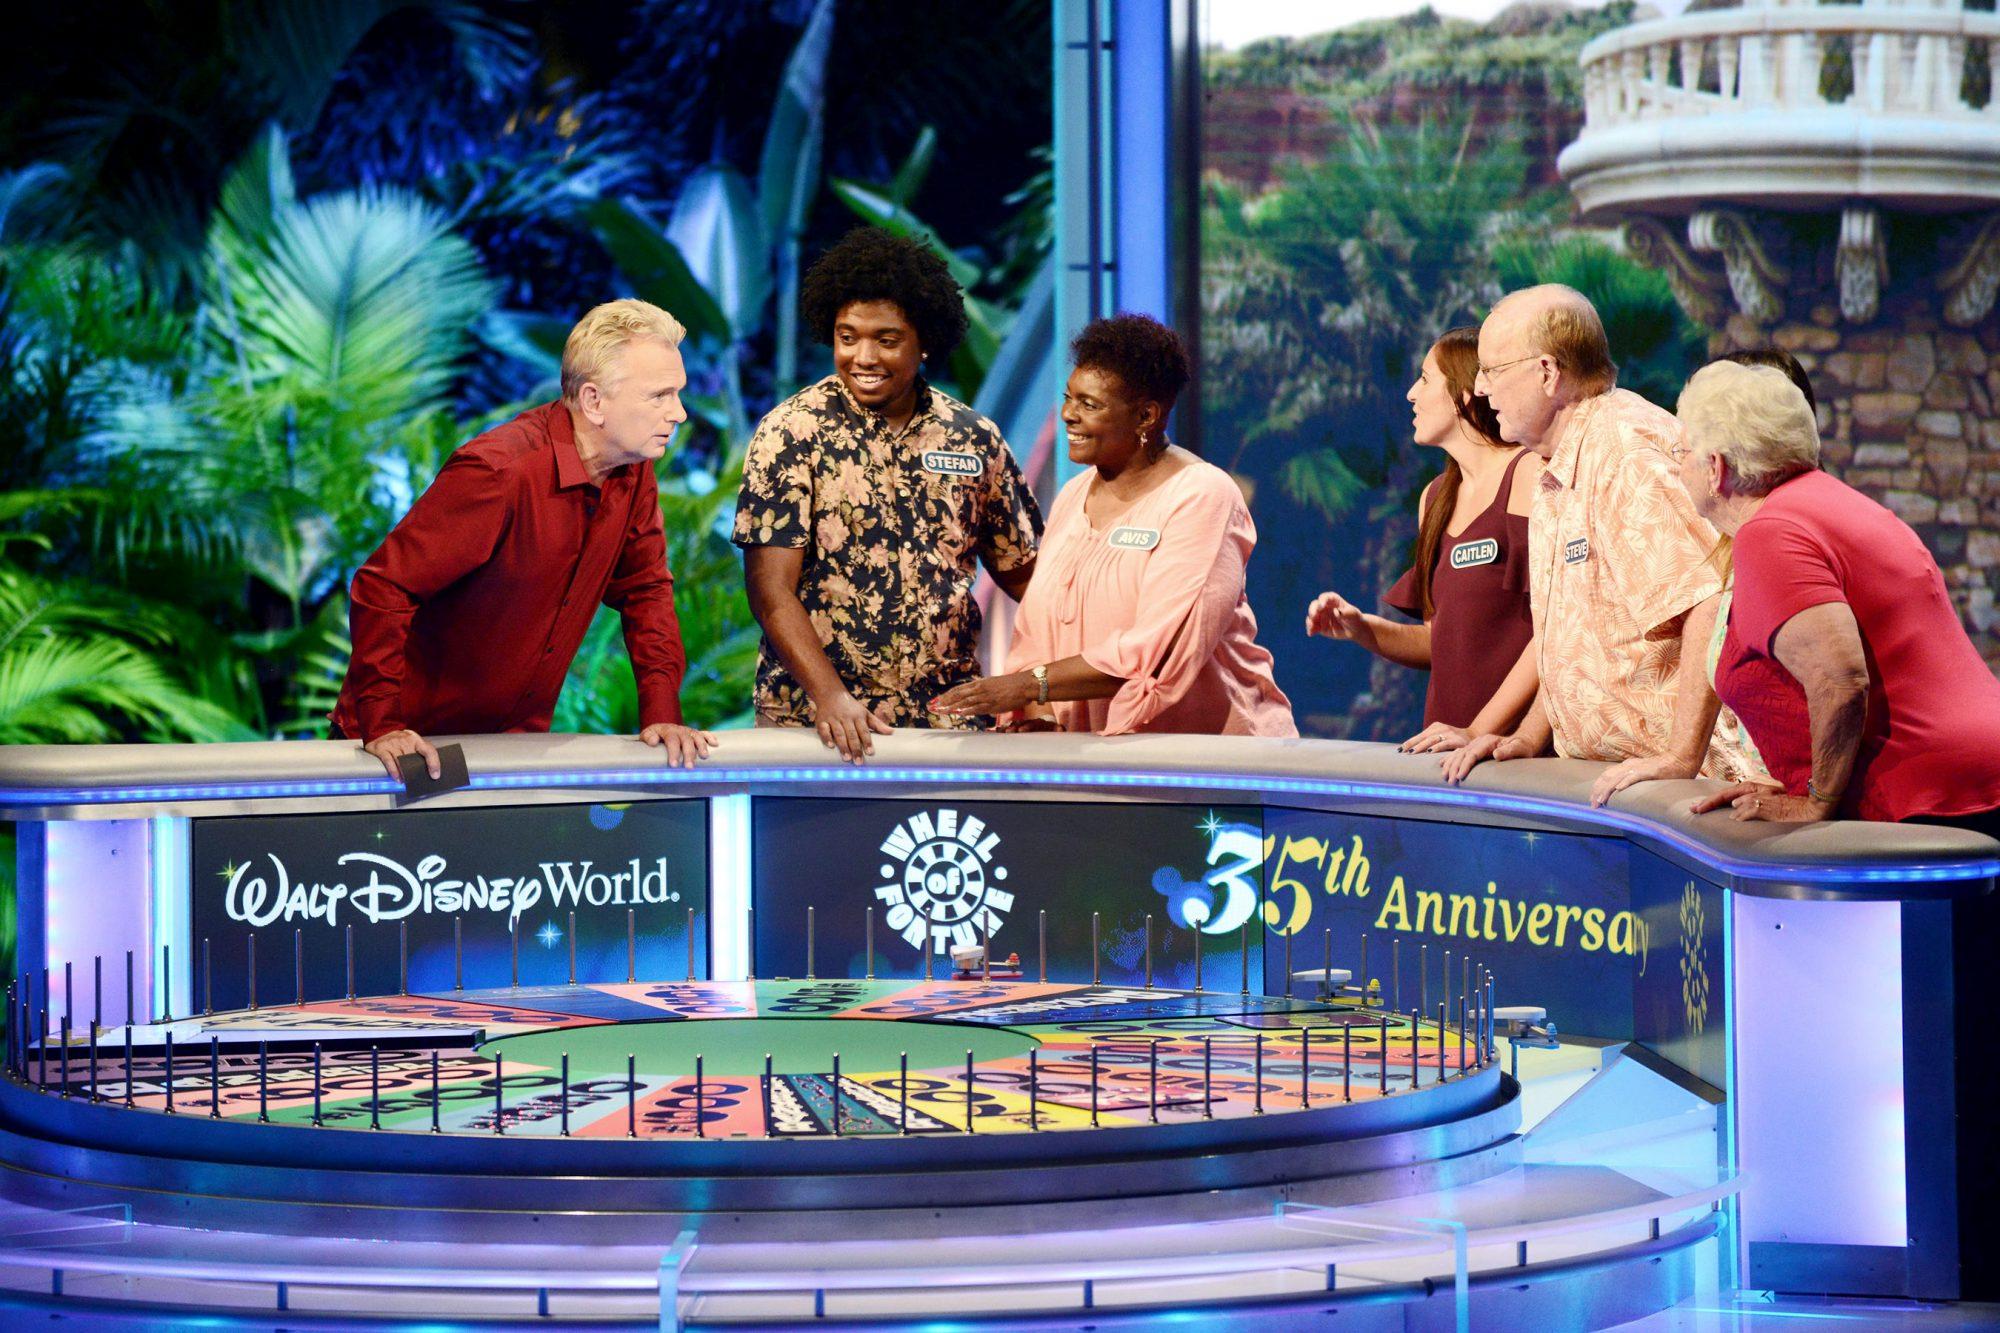 """Wheel Of Fortune"" Celebrates 35th Anniversary Of Disney's Epcot Center"